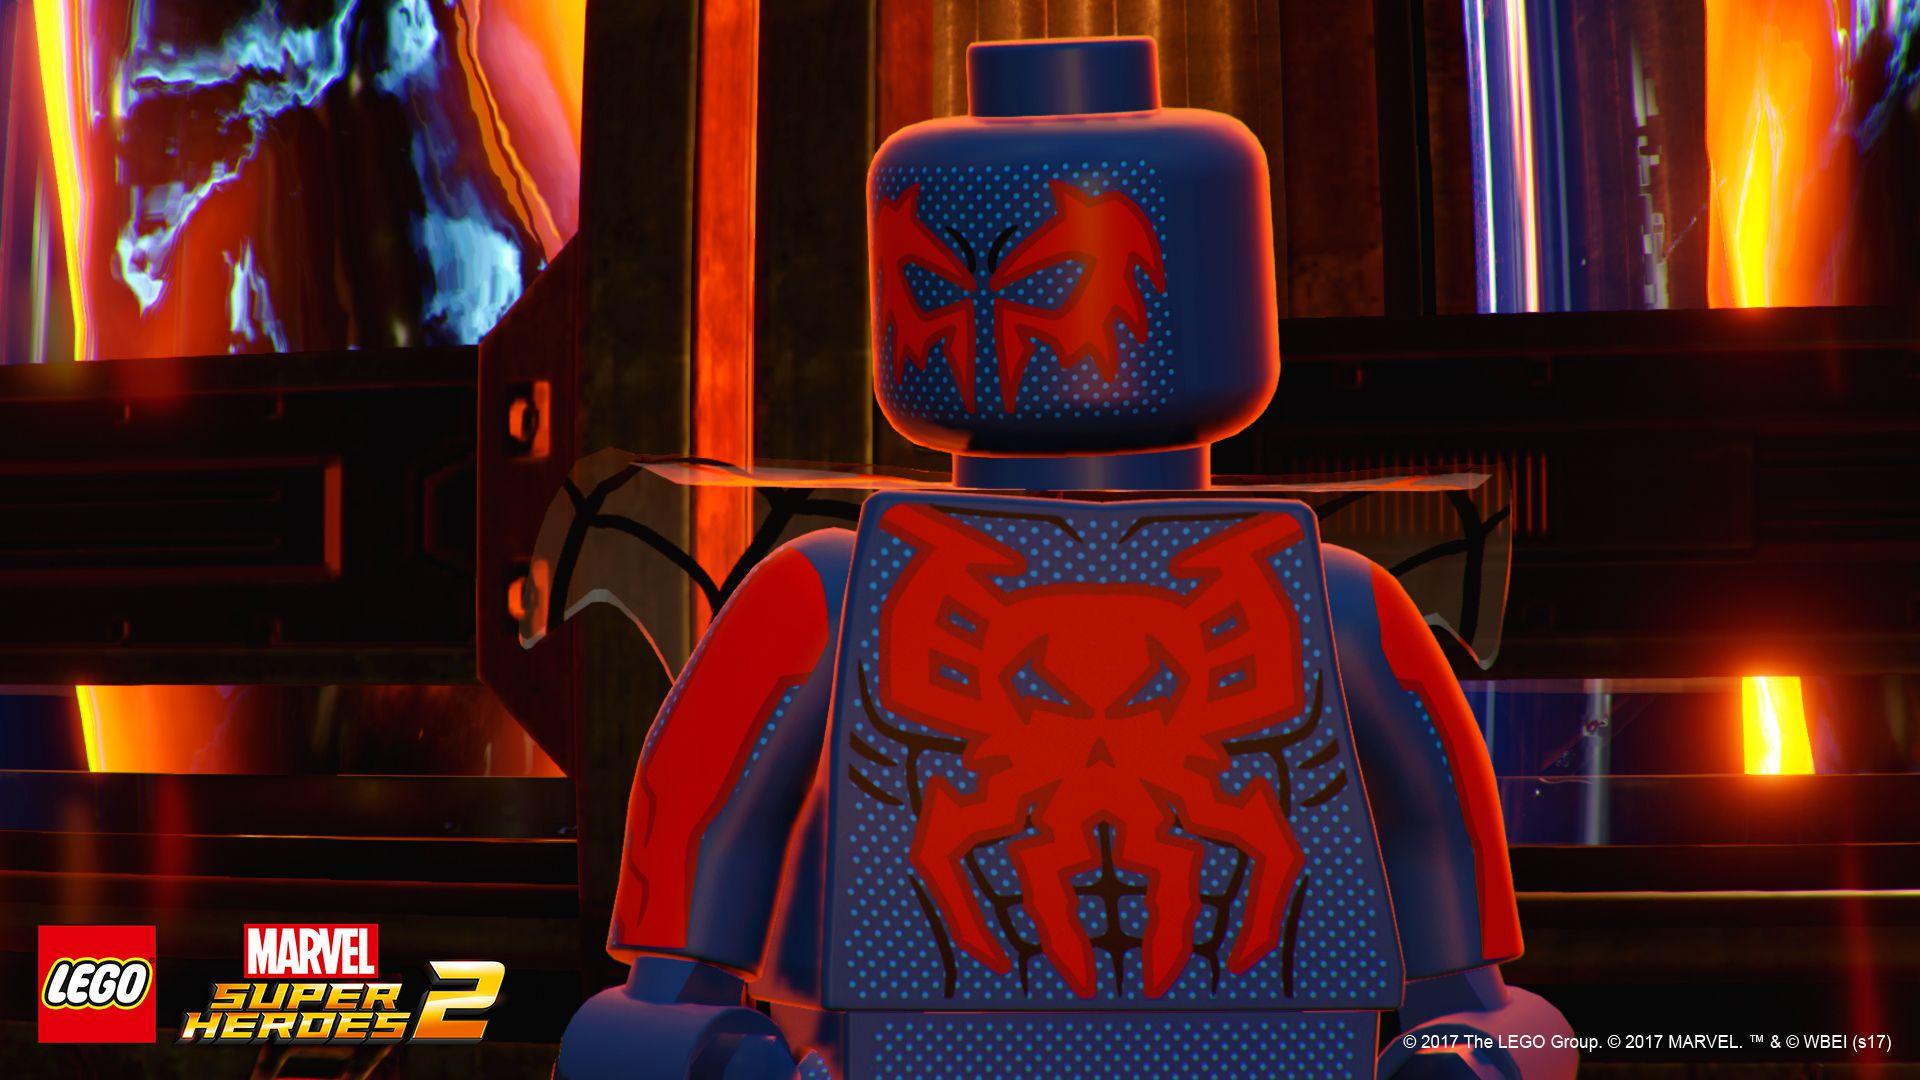 LEGO Marvel Super Heroes 2 (Xbox One) - 4